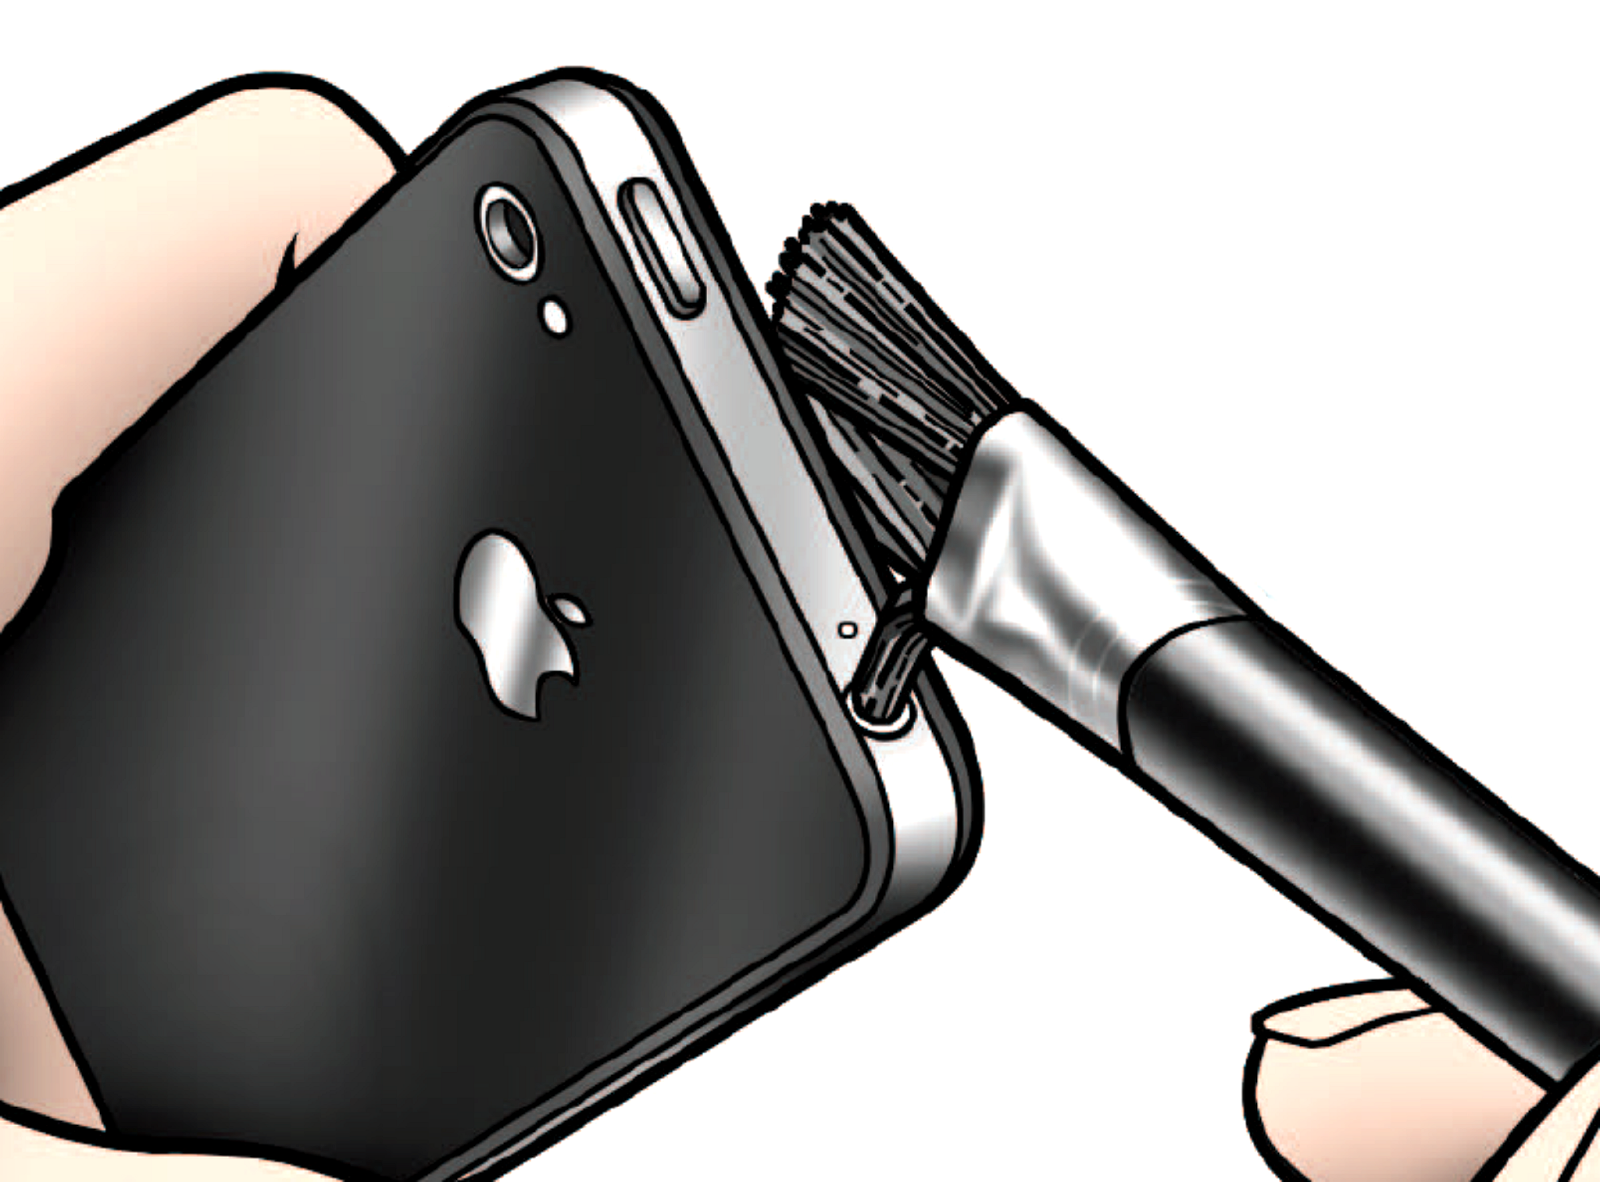 iphone 6s user guide manual